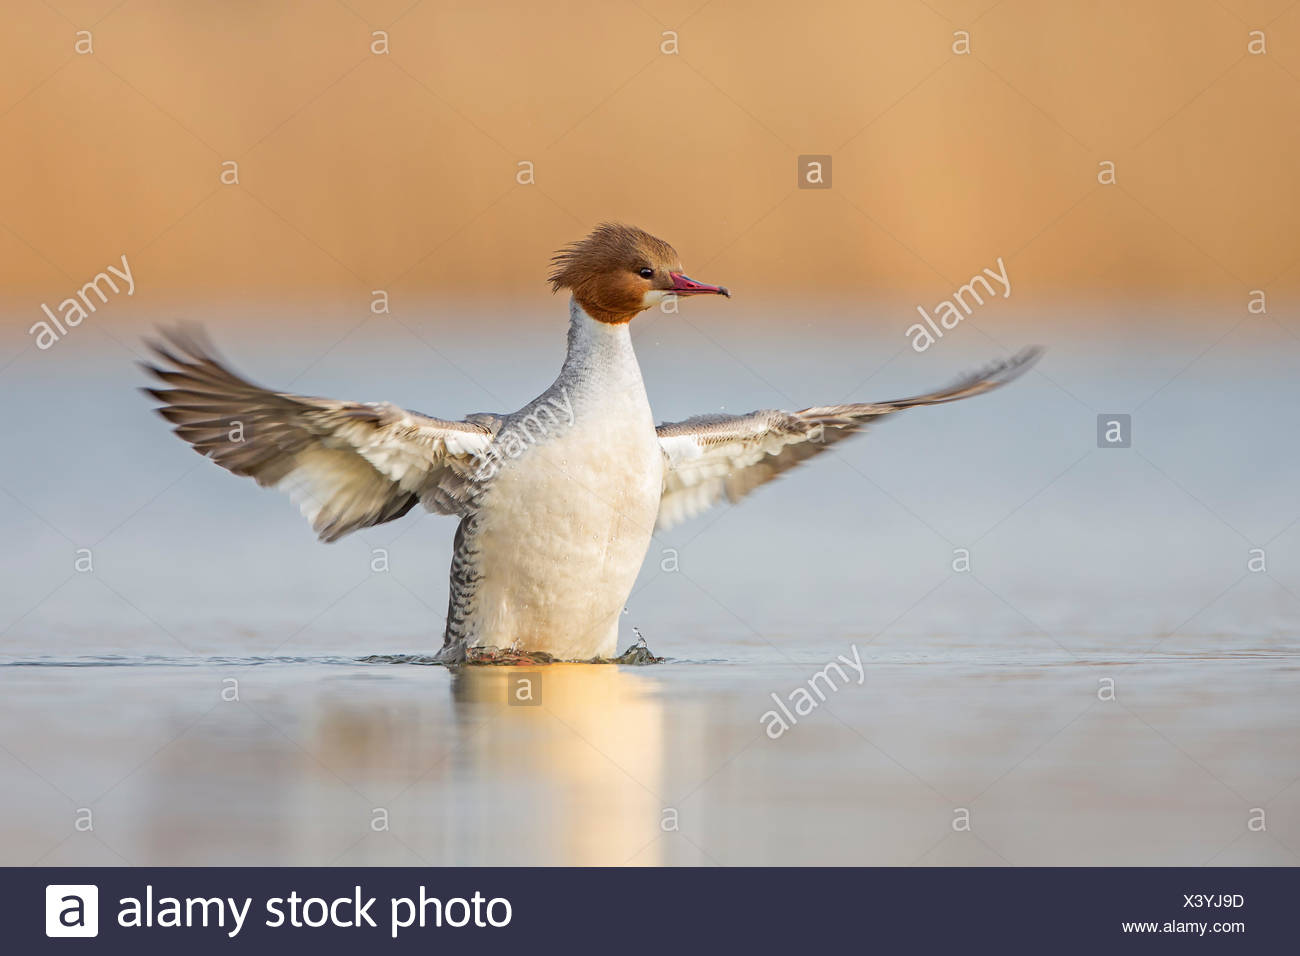 Goosander (Mergus merganser) female, wings extended, flapping, Middle Elbe River, Saxony-Anhalt, Germany - Stock Image